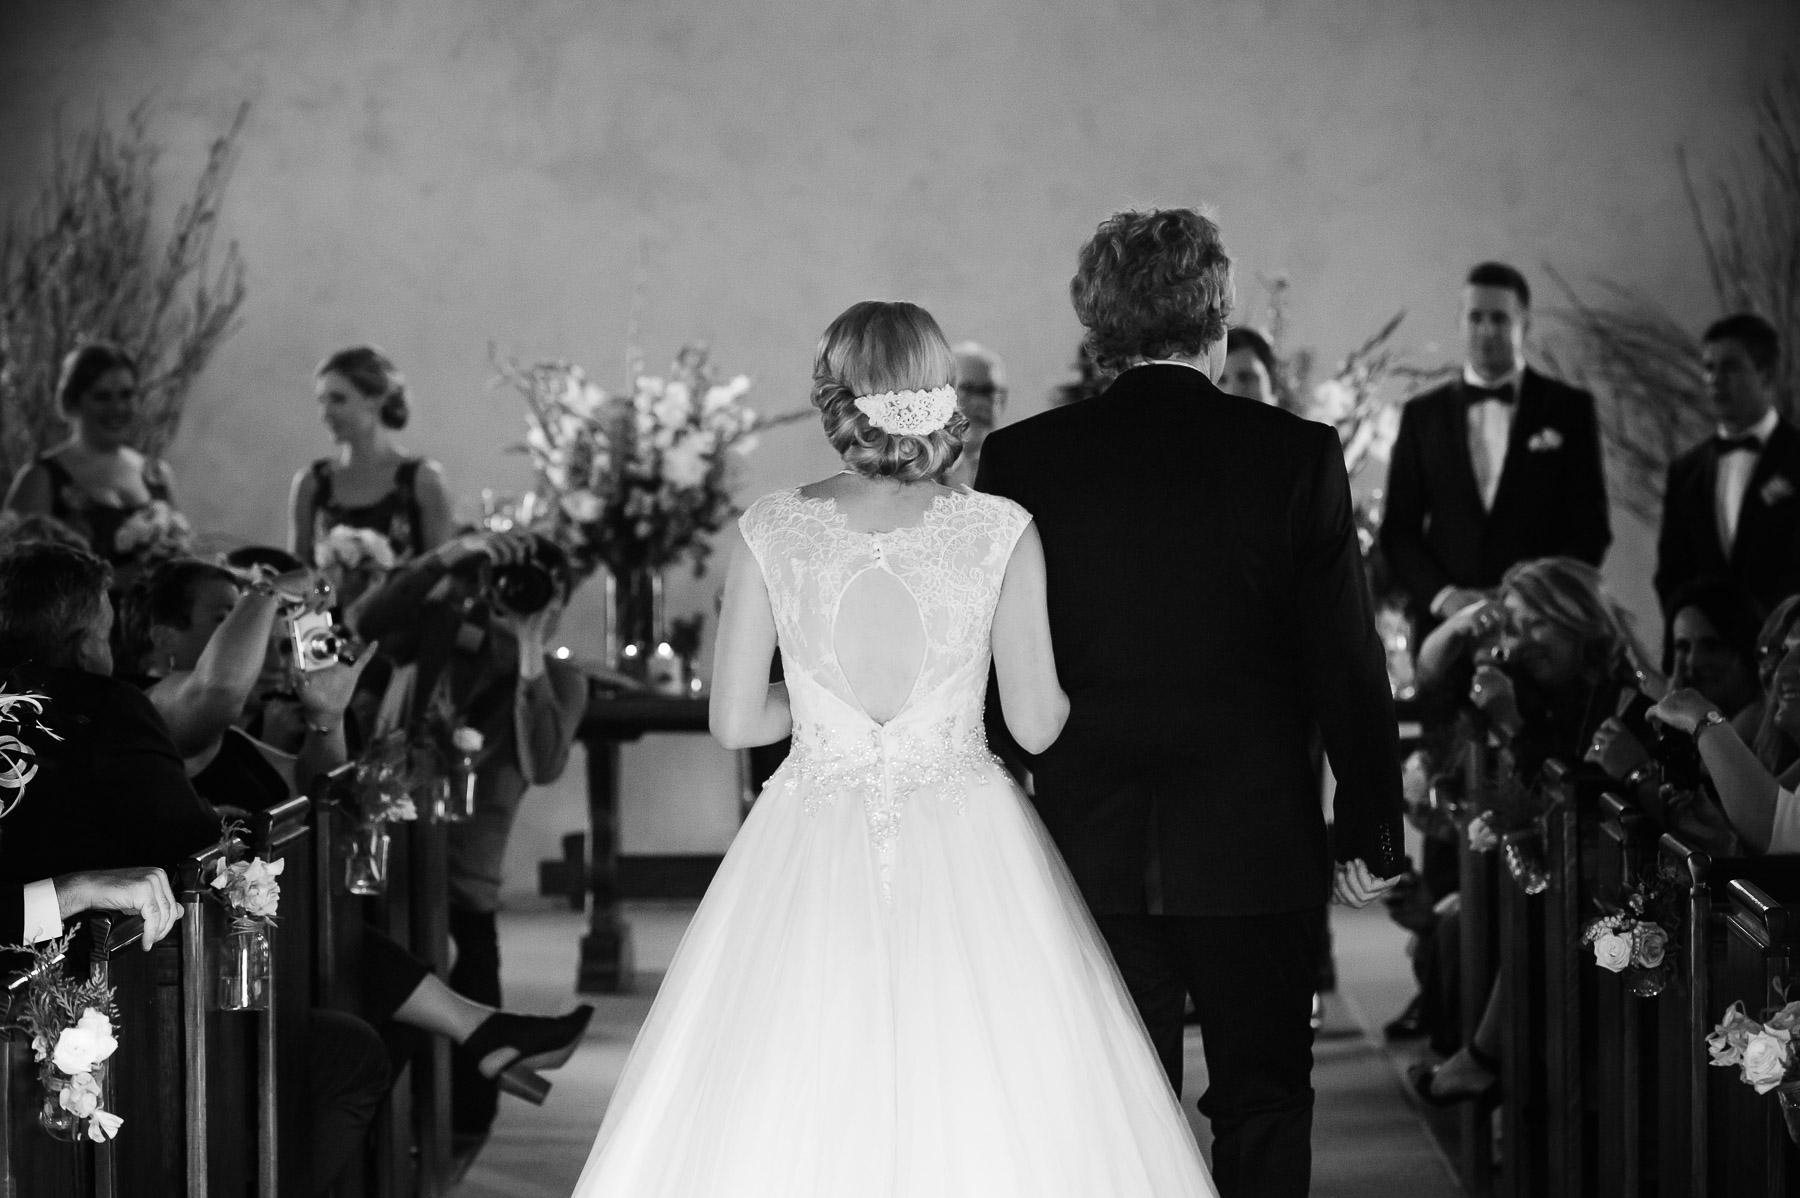 Marnie_and_Charlie_Yarra_Valley_Wedding_Blog-41.jpg